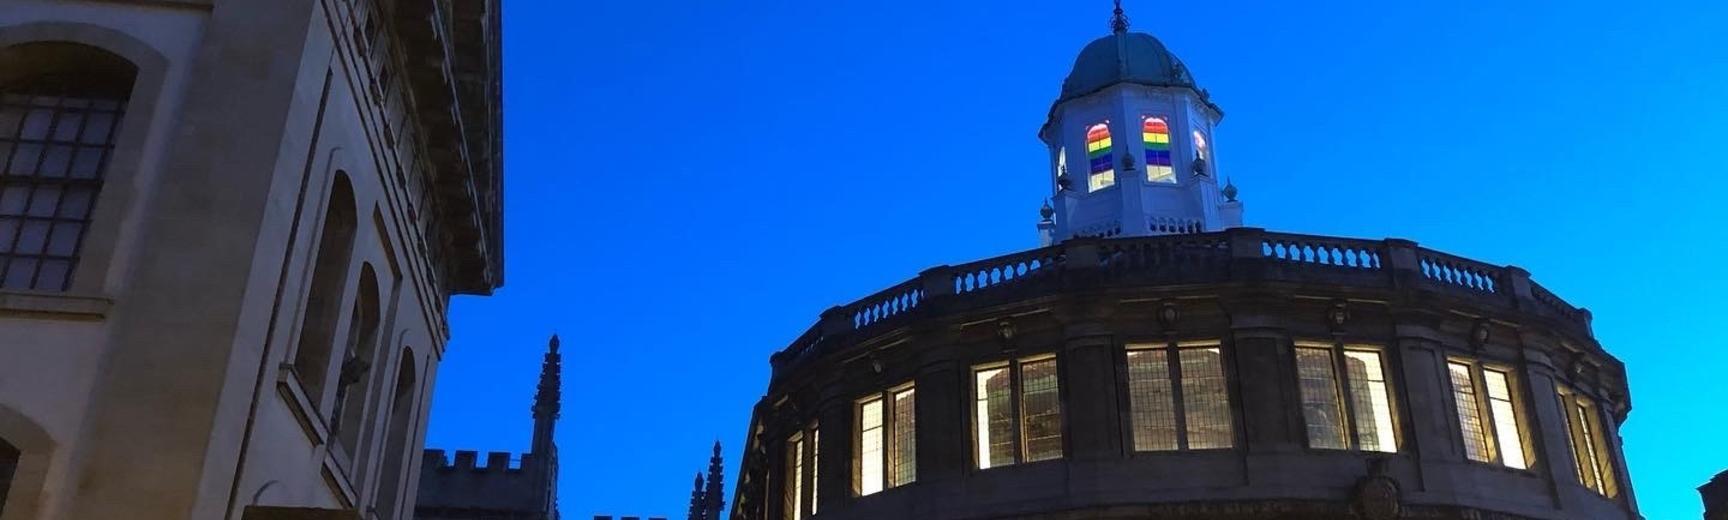 Photo of Sheldonian Theatre lit up against dark blue sky